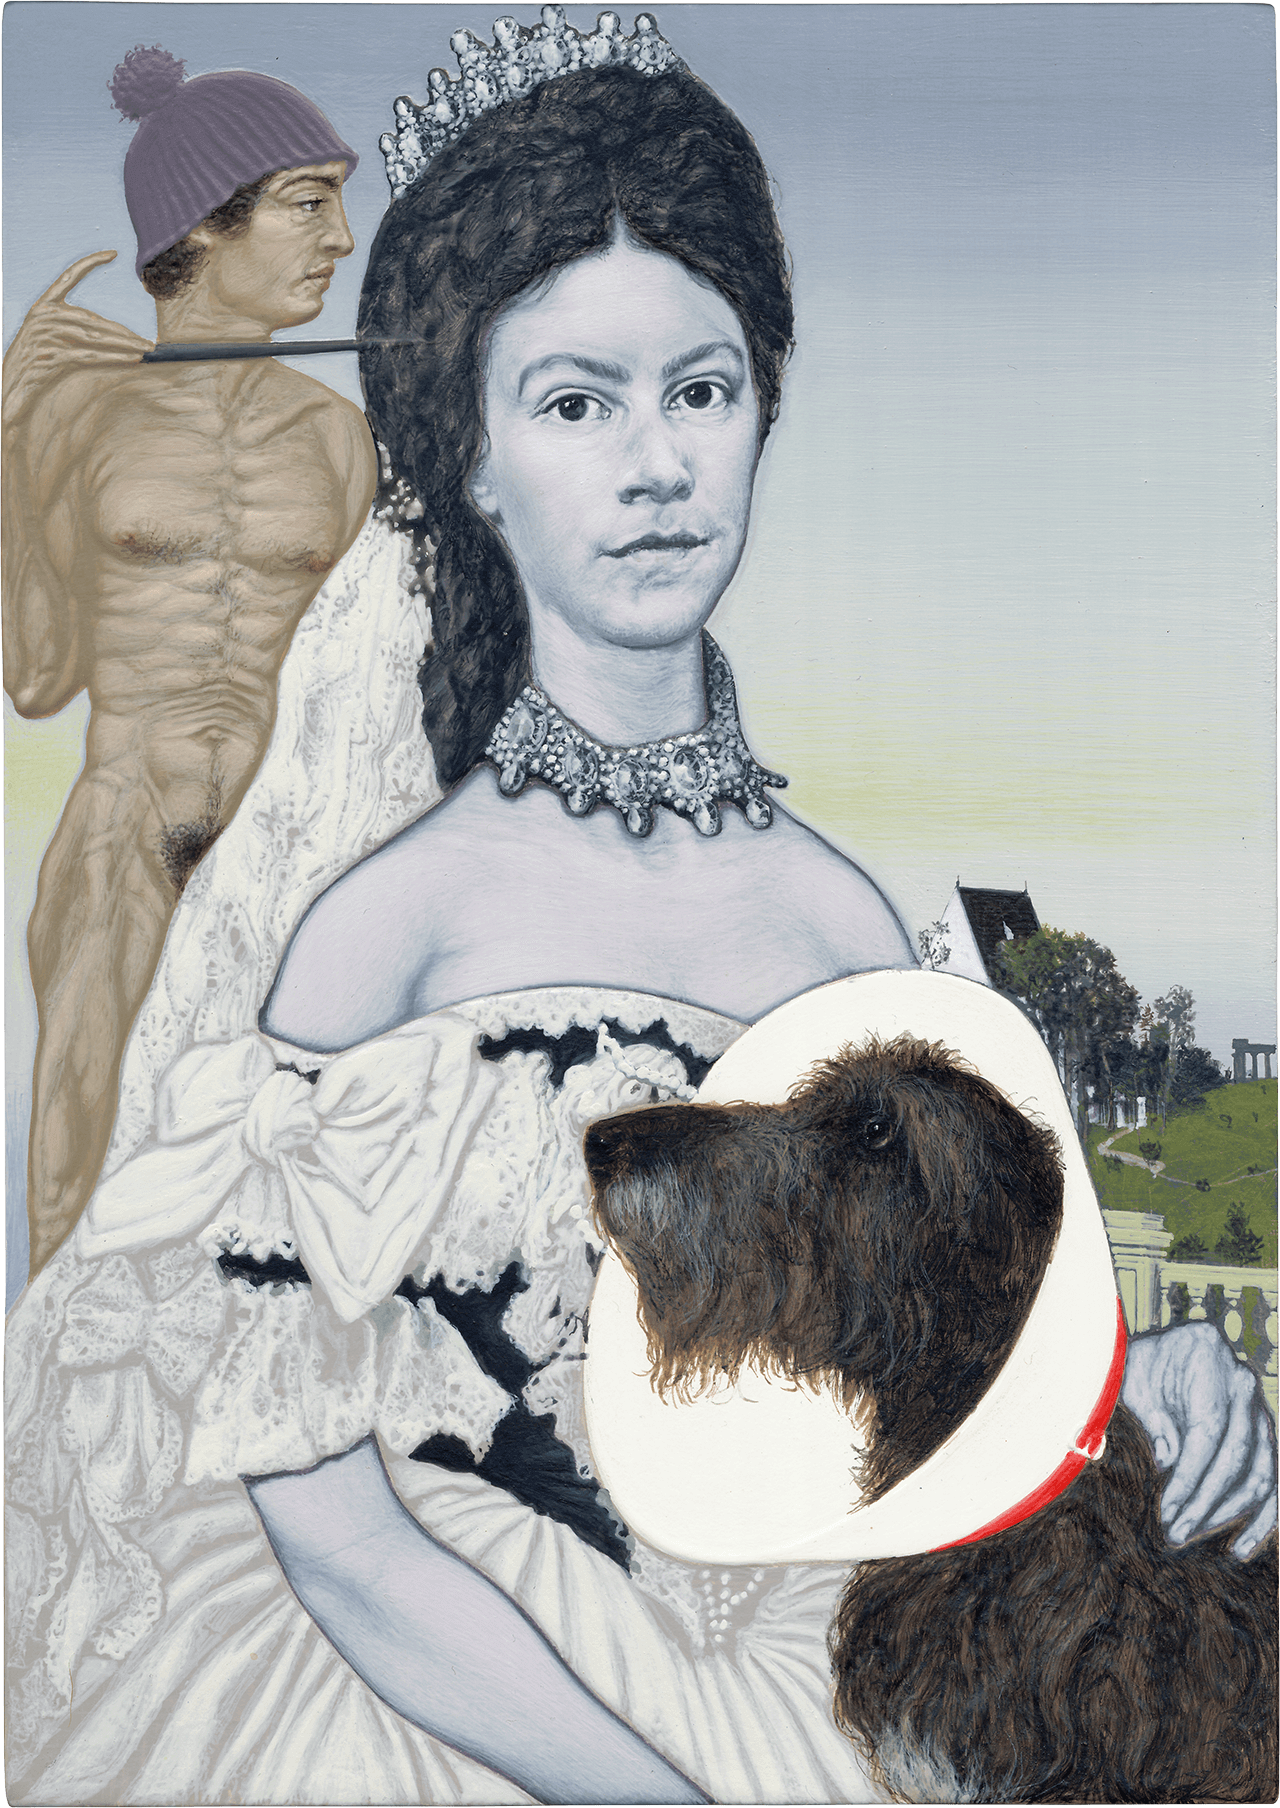 Elizabethan Collar, 2014, ακρυλικό σε ξύλο, 21x15 εκ.